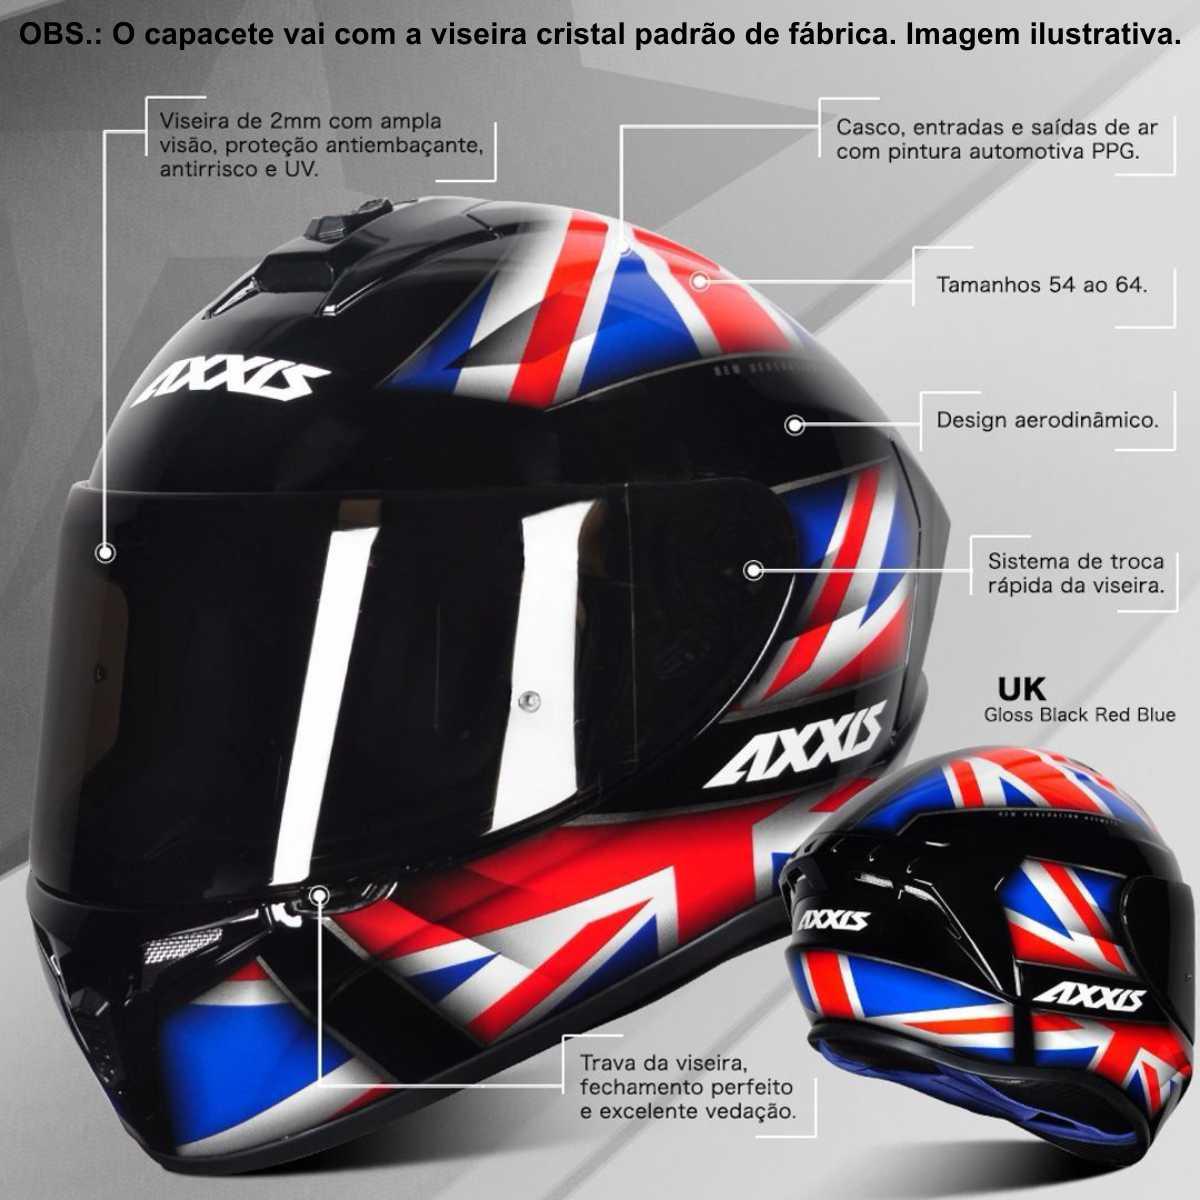 CAPACETE MASCULINO MOTO AXXIS DRAKEN UK INGLATERRA PRETO VERMELHO AZUL BRILHANTE